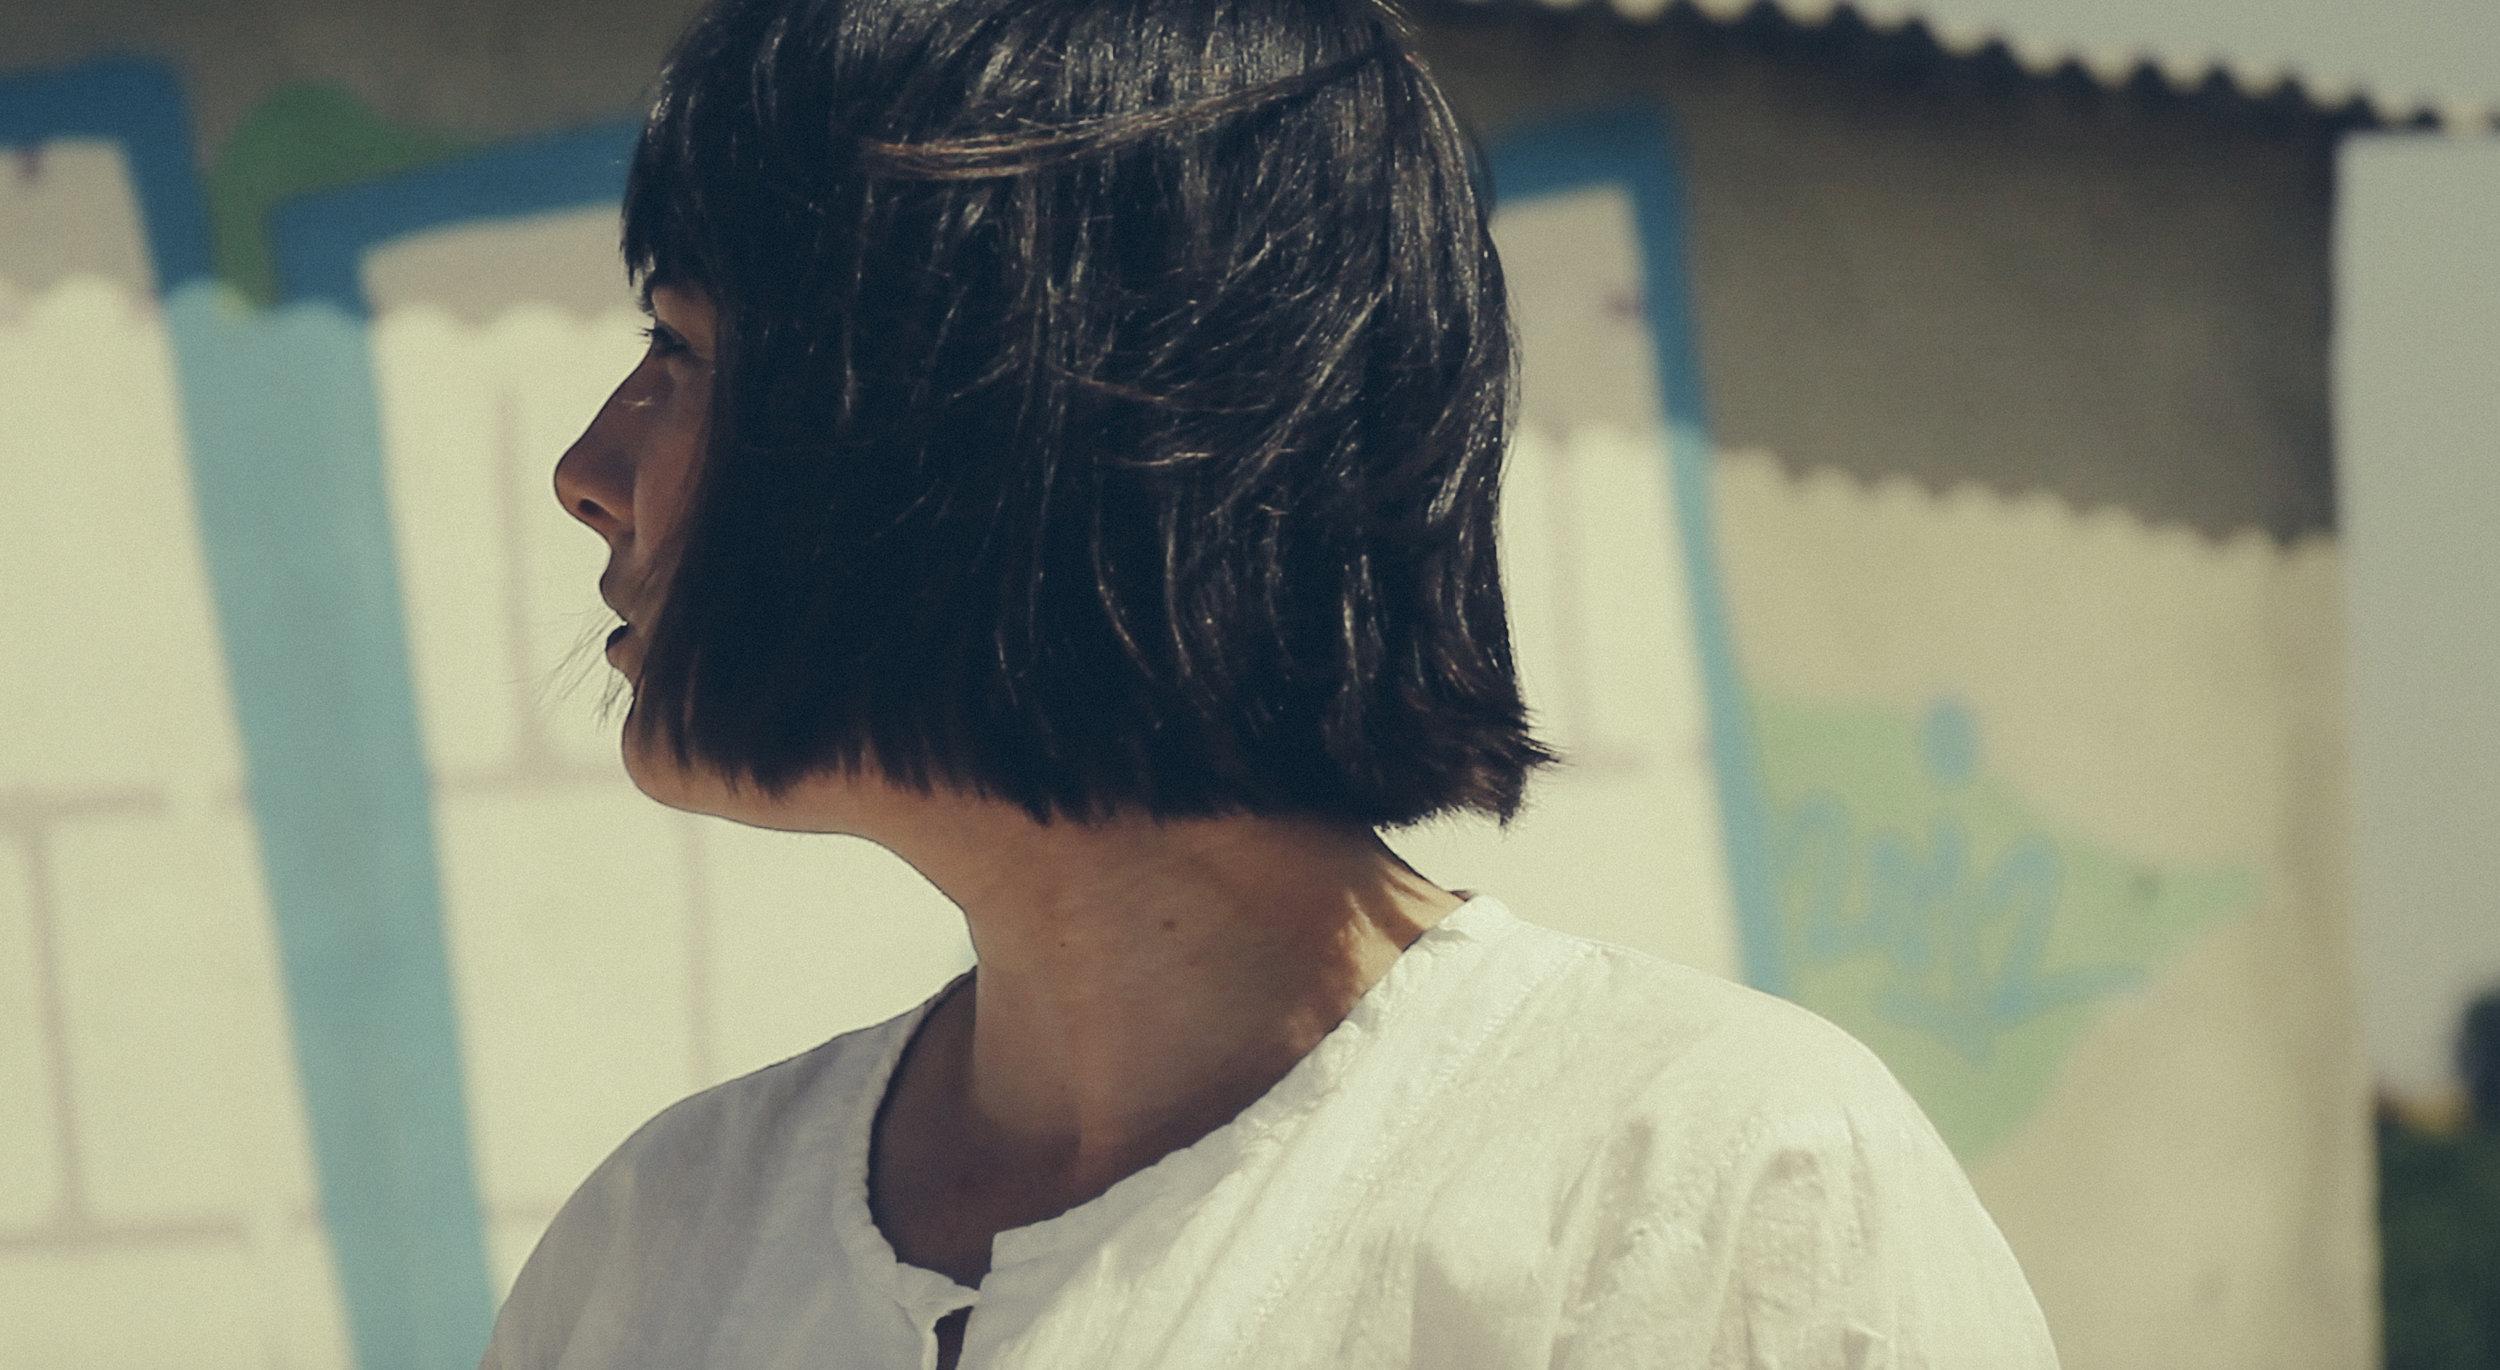 film still by jessa carter (murcia, spain)